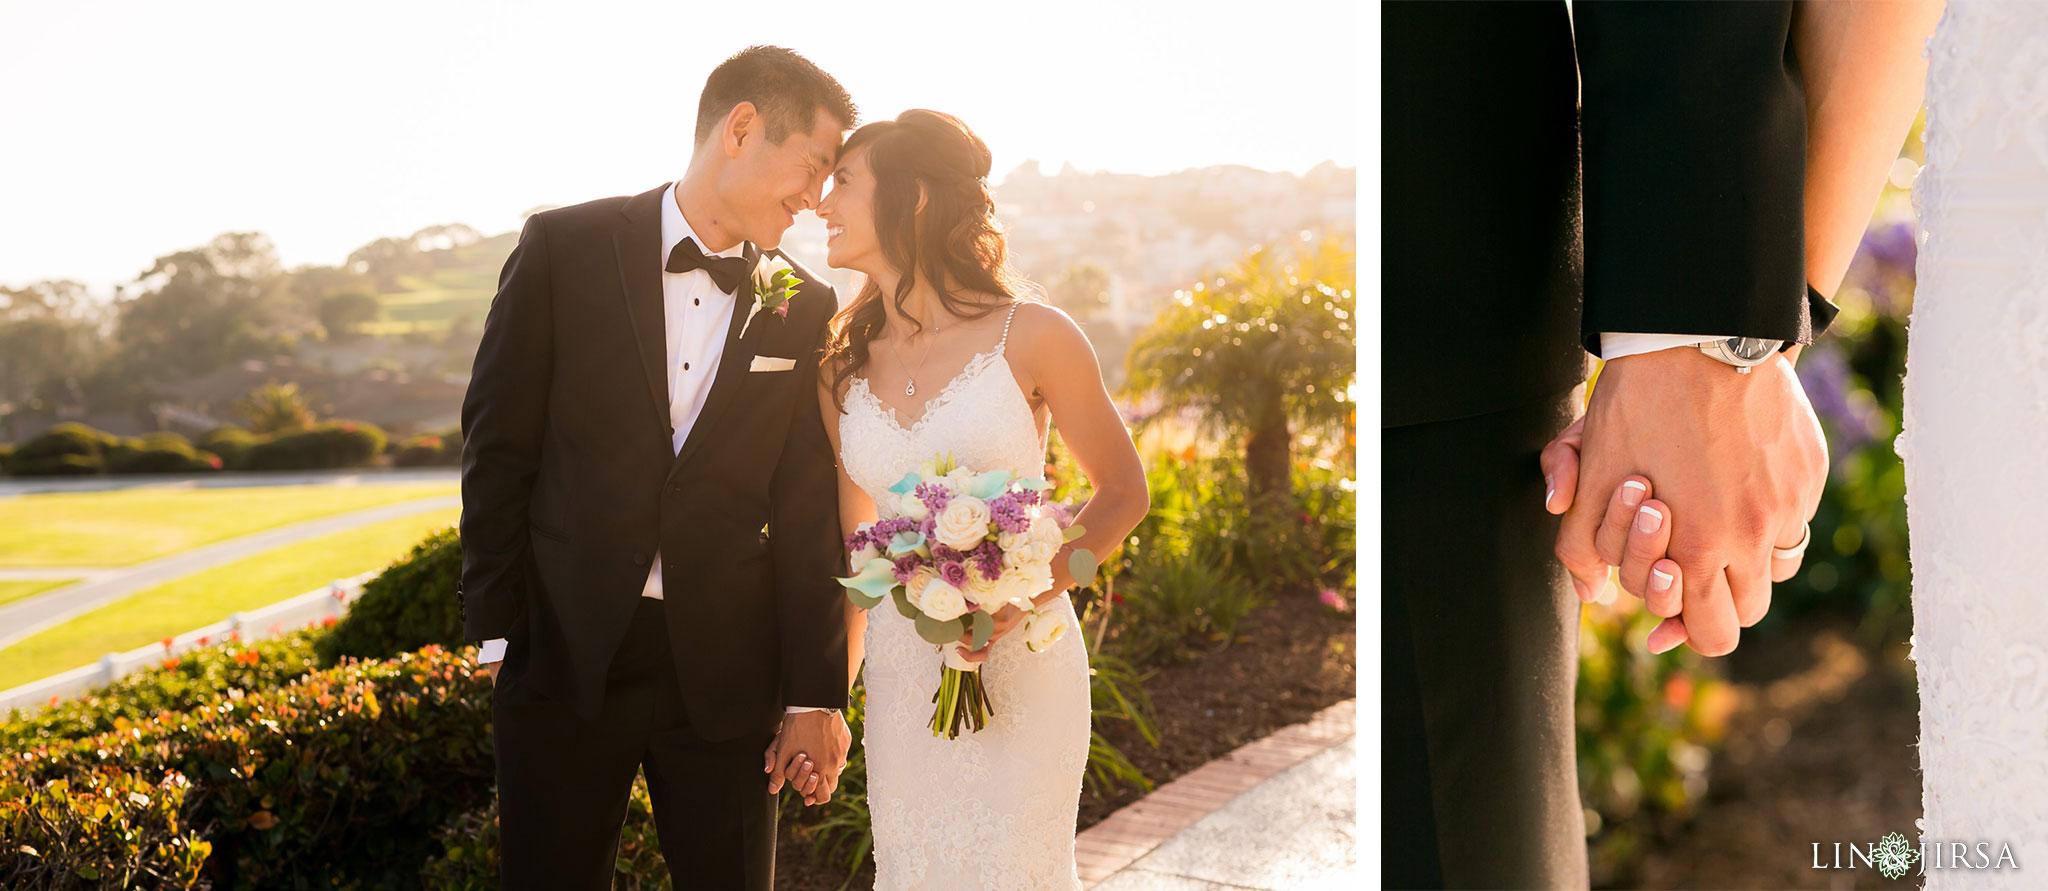 26 laguna cliffs marriott dana point wedding photography